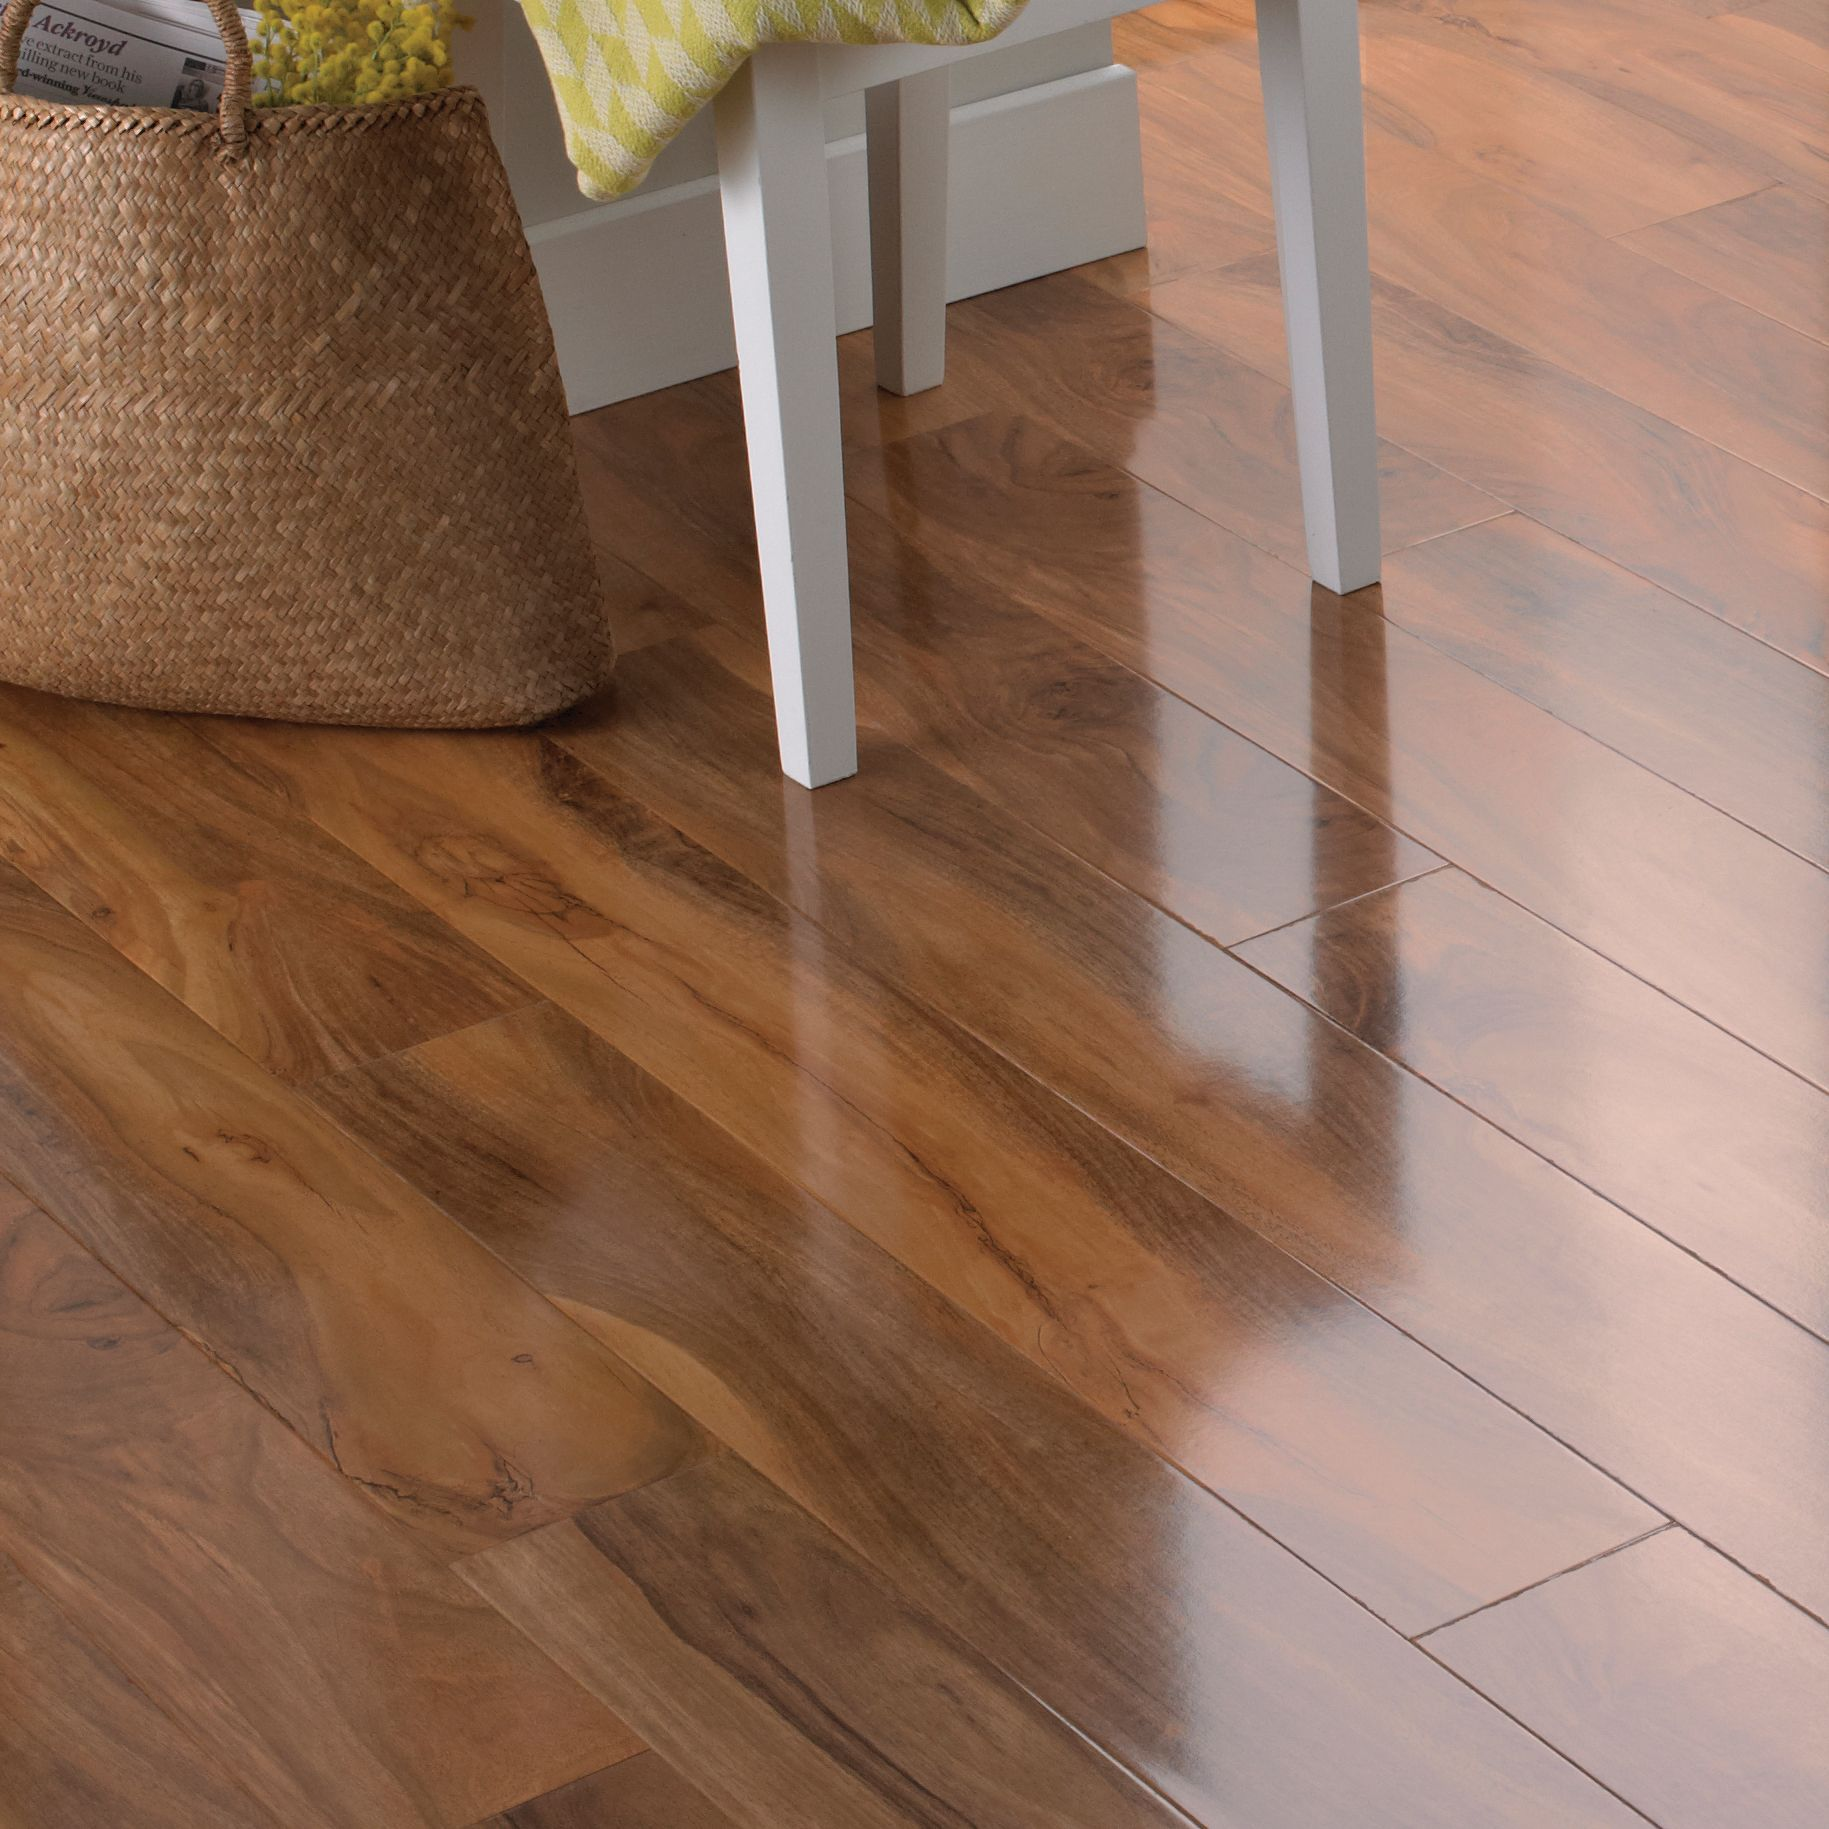 Dolce High Gloss Walnut Effect Laminate Flooring 1.19 m²